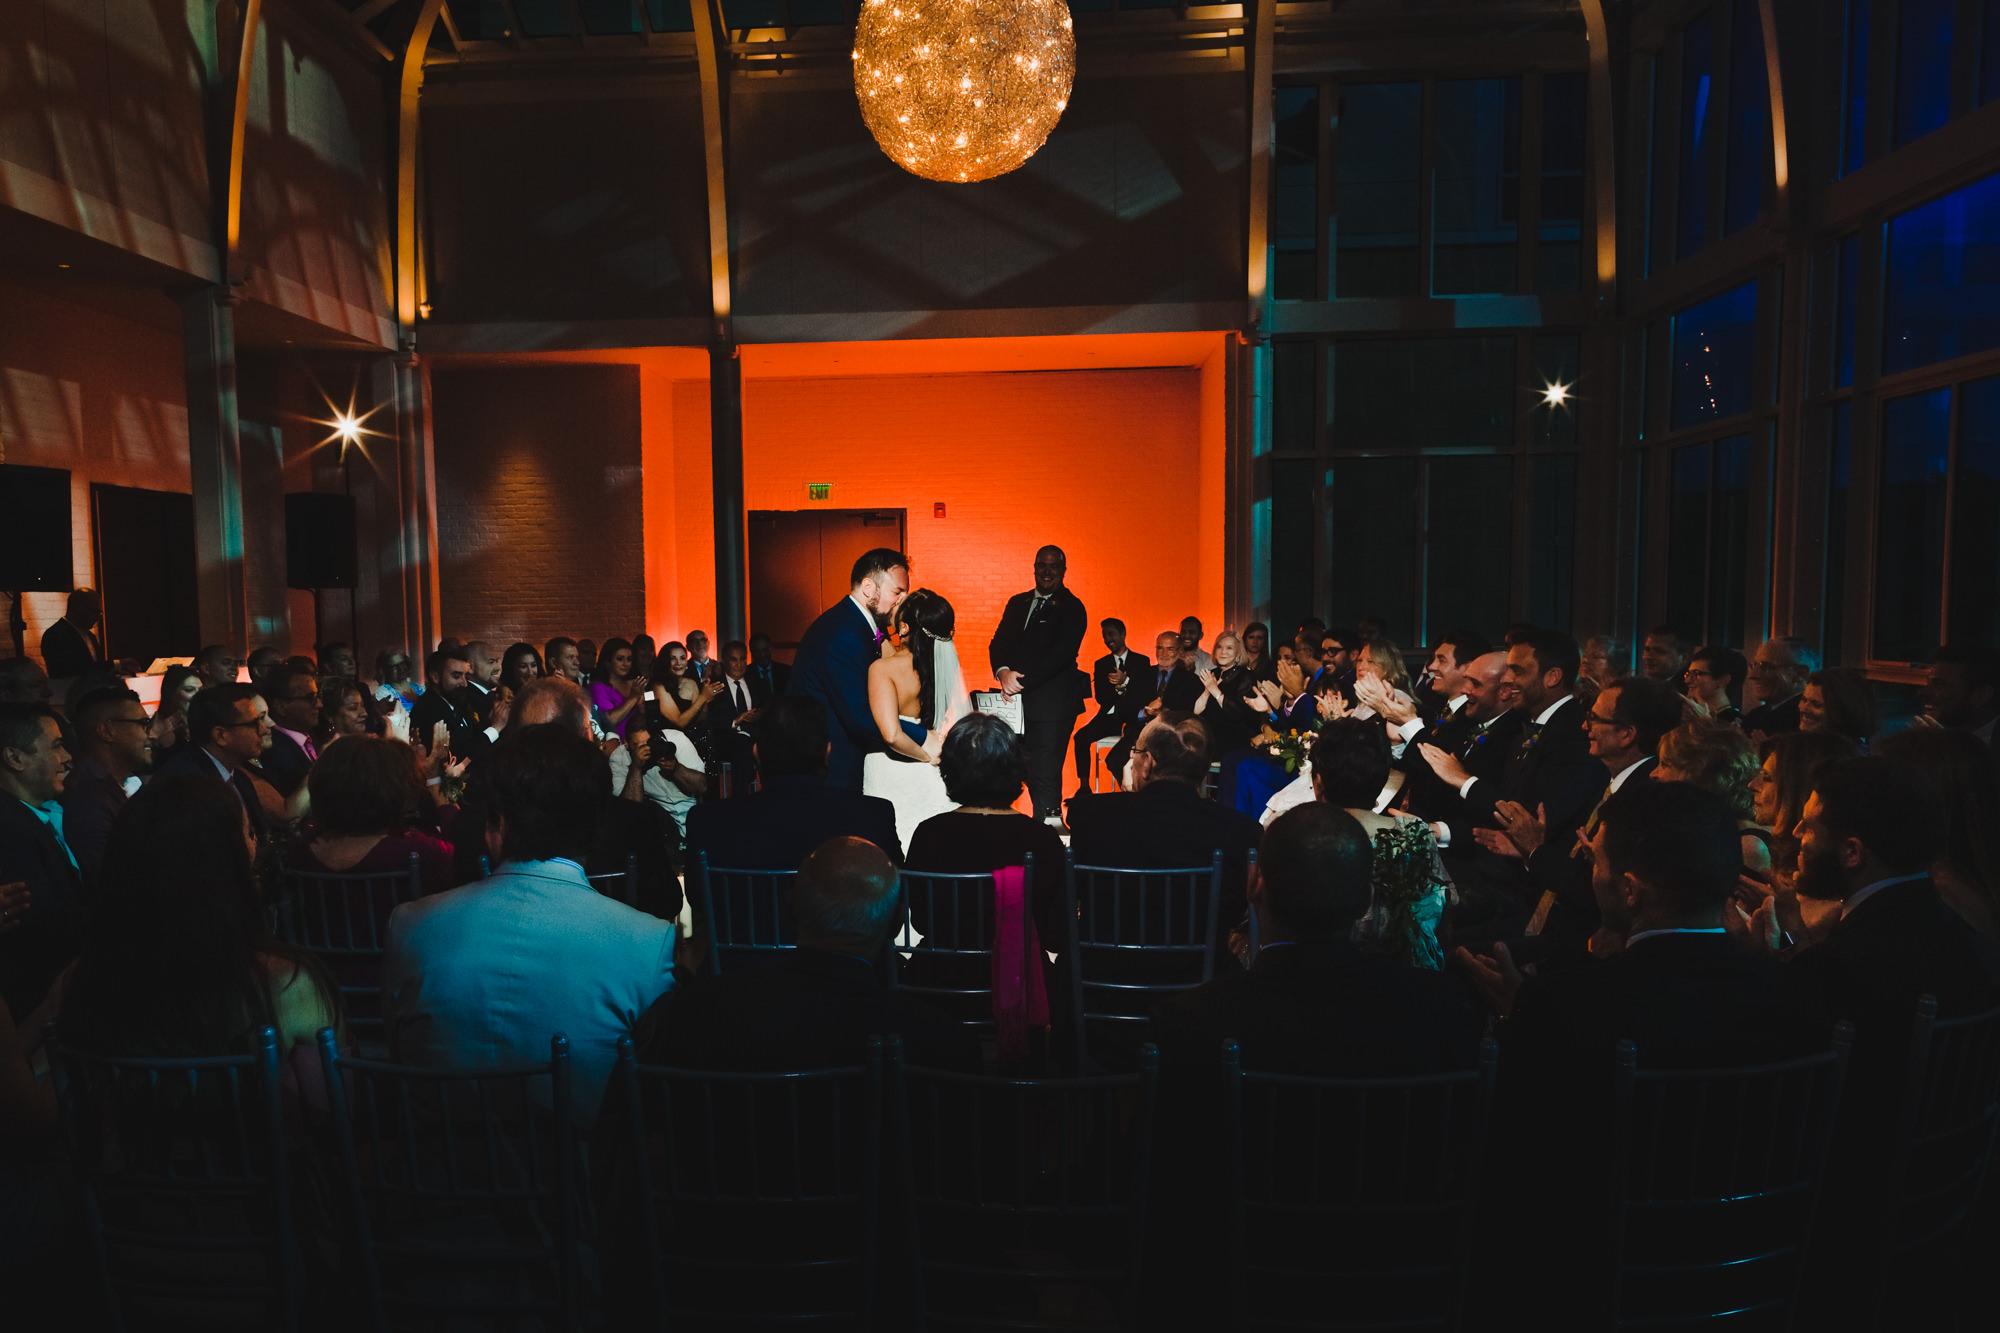 Embassy Suites Wedding Jen & Scott at Hilton Berkeley Heights 00017.JPG